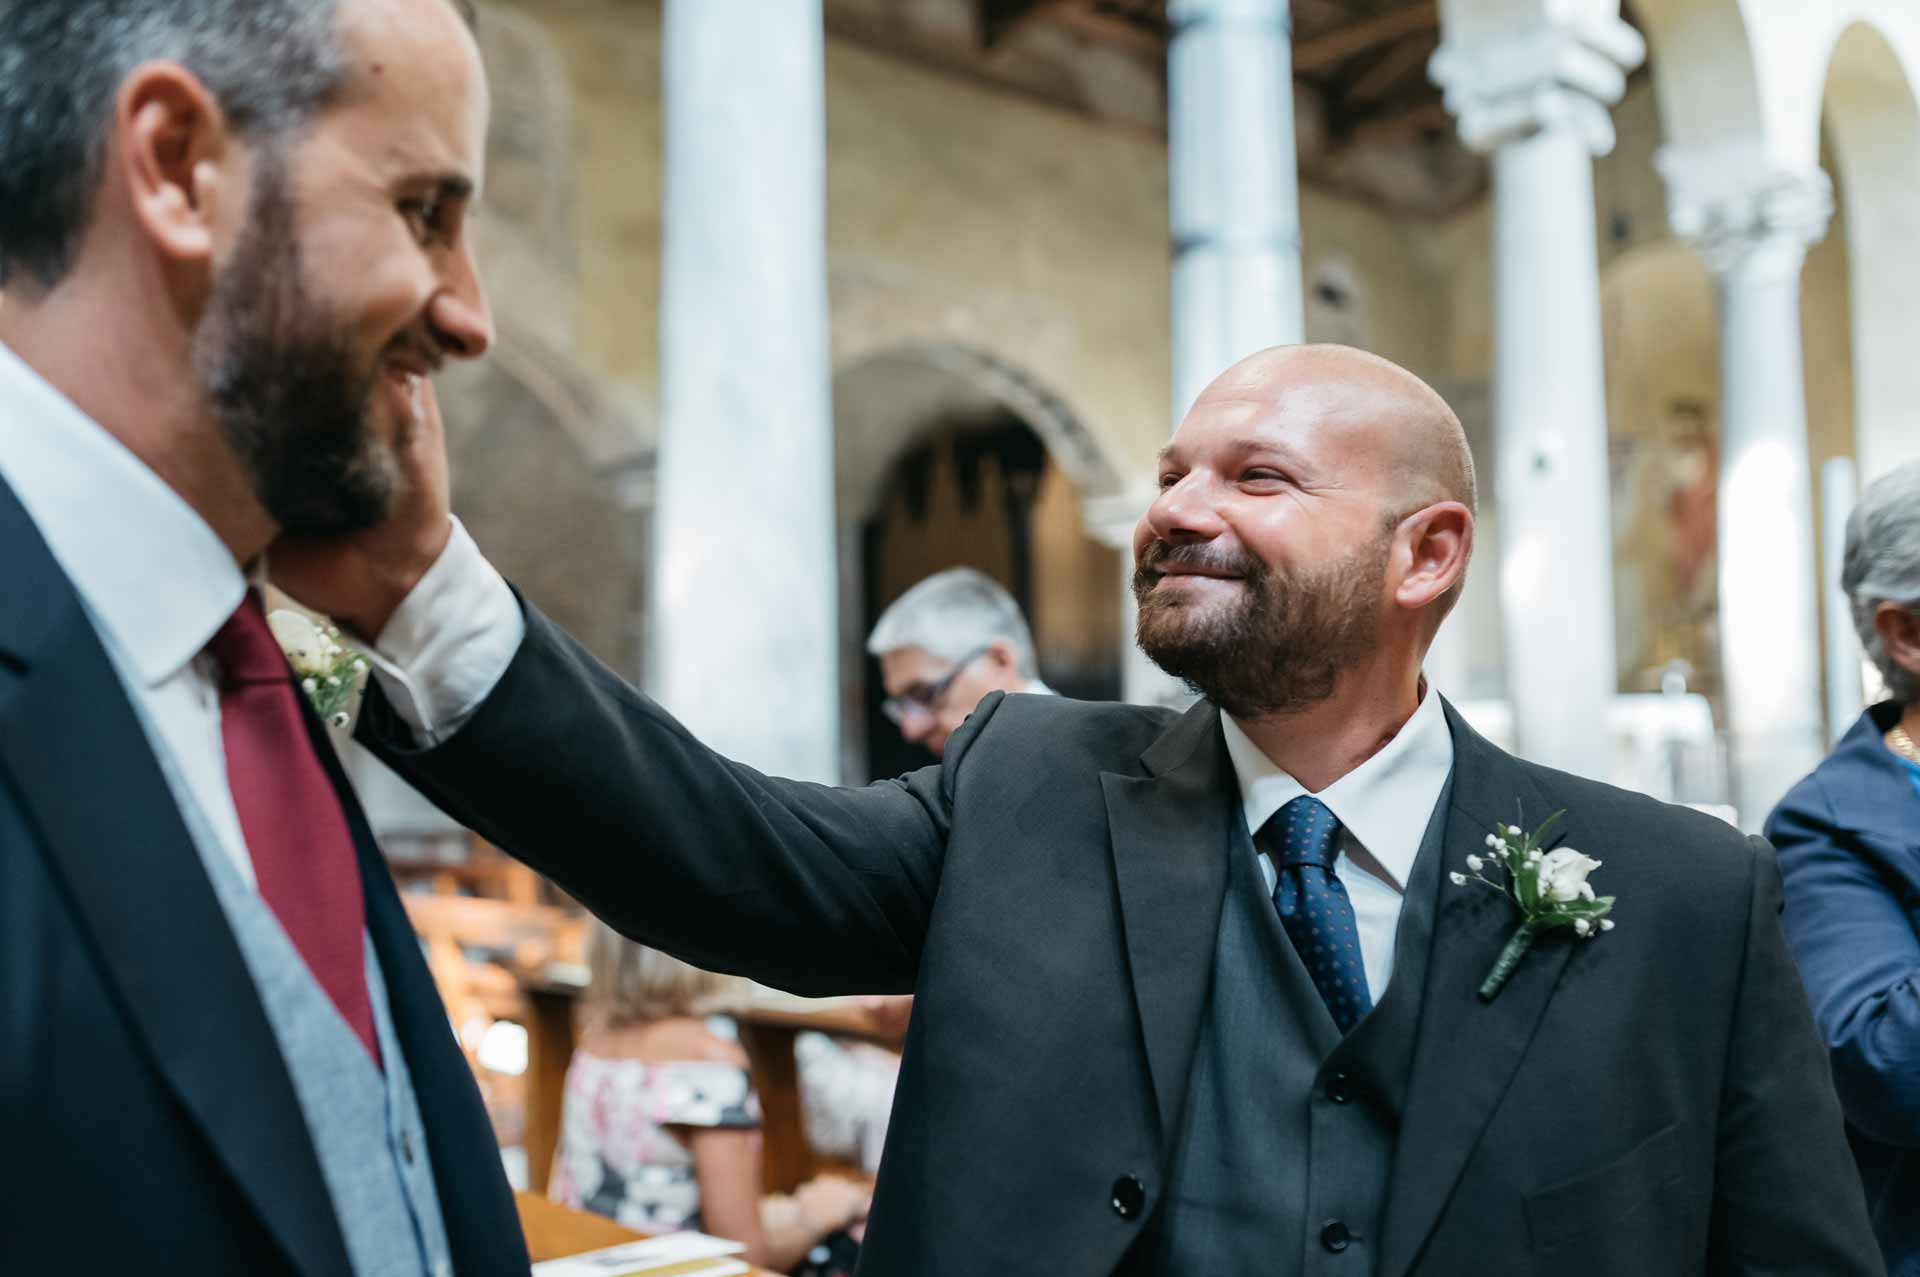 Fotografo-Matrimonio-Roma-Slide-i-54